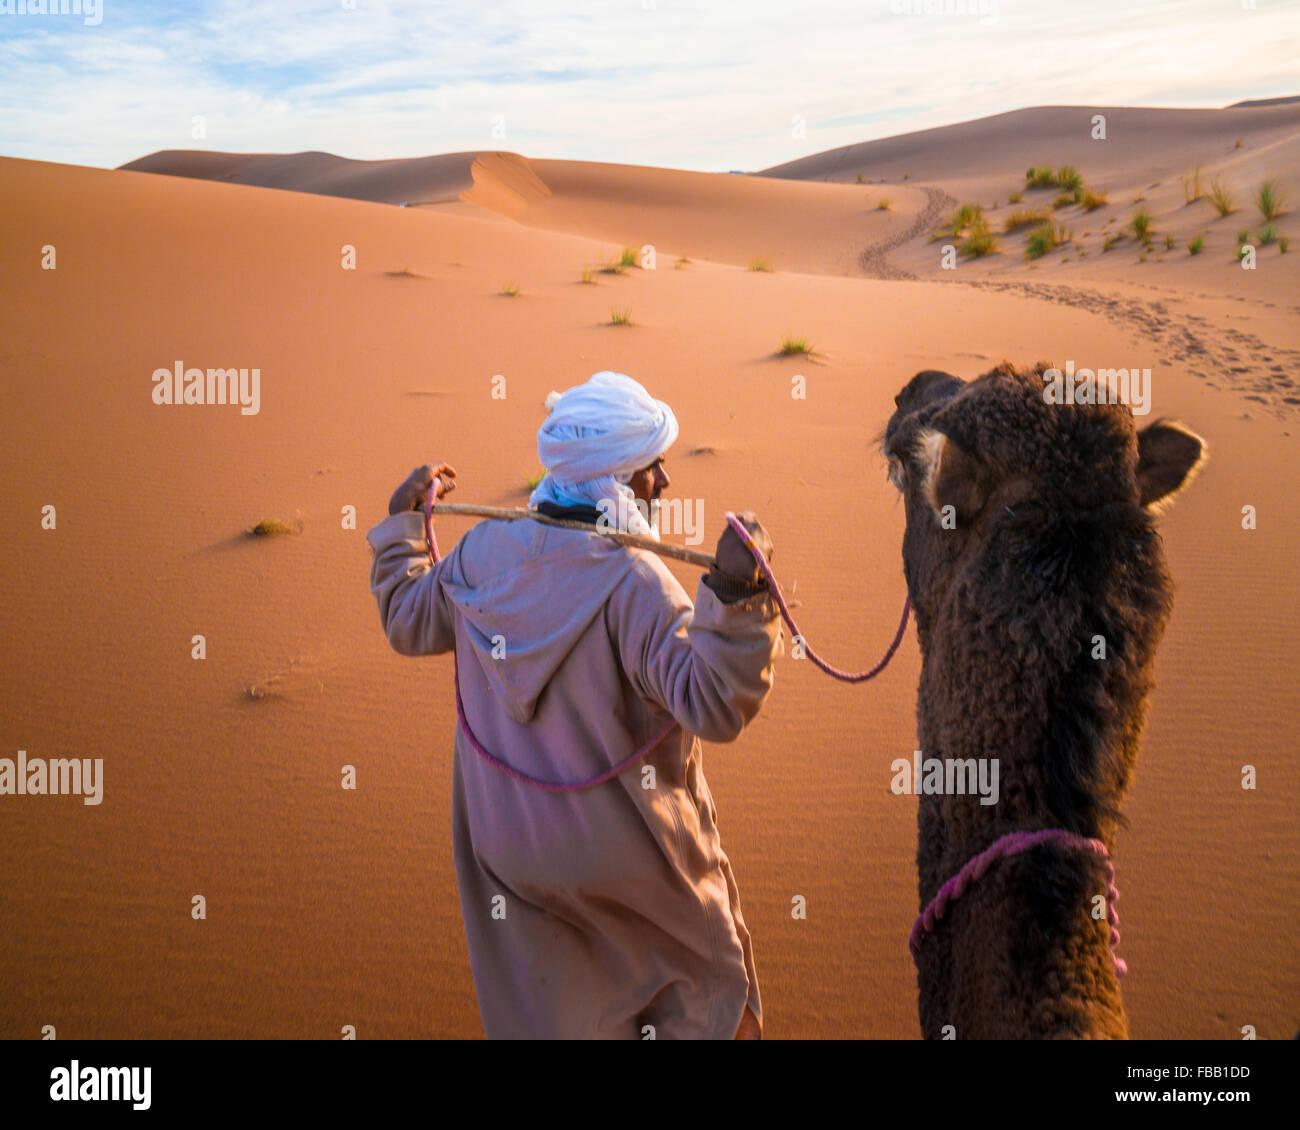 Hombre conduciendo camel, Erg Chegaga Marruecos Imagen De Stock